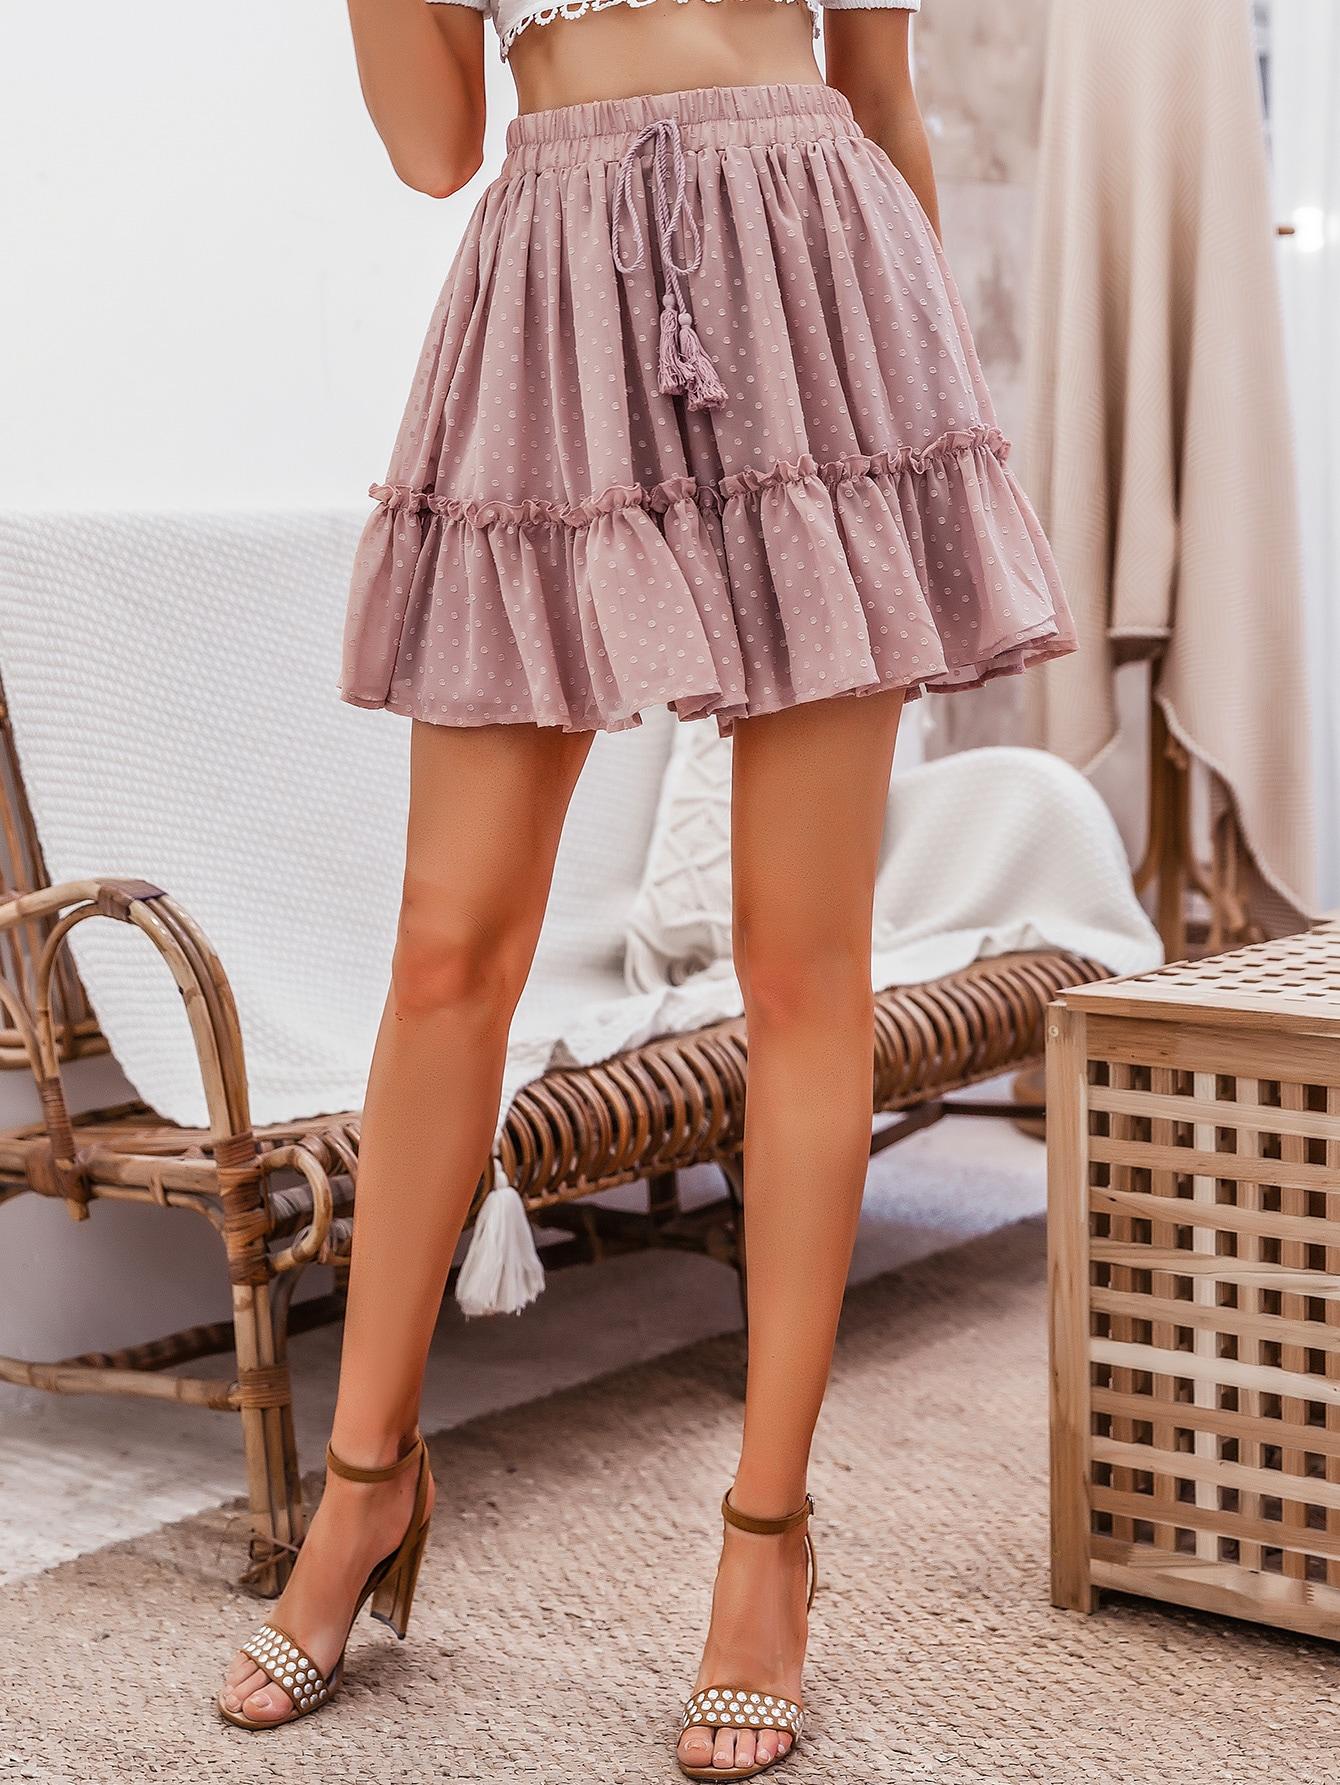 Women Boho Mini Skirt Flared Skirt Casual Skirt Short Pink Skirt Drawstring Waist Swiss Dot Frill Trim Skirt Bohemian Clothes